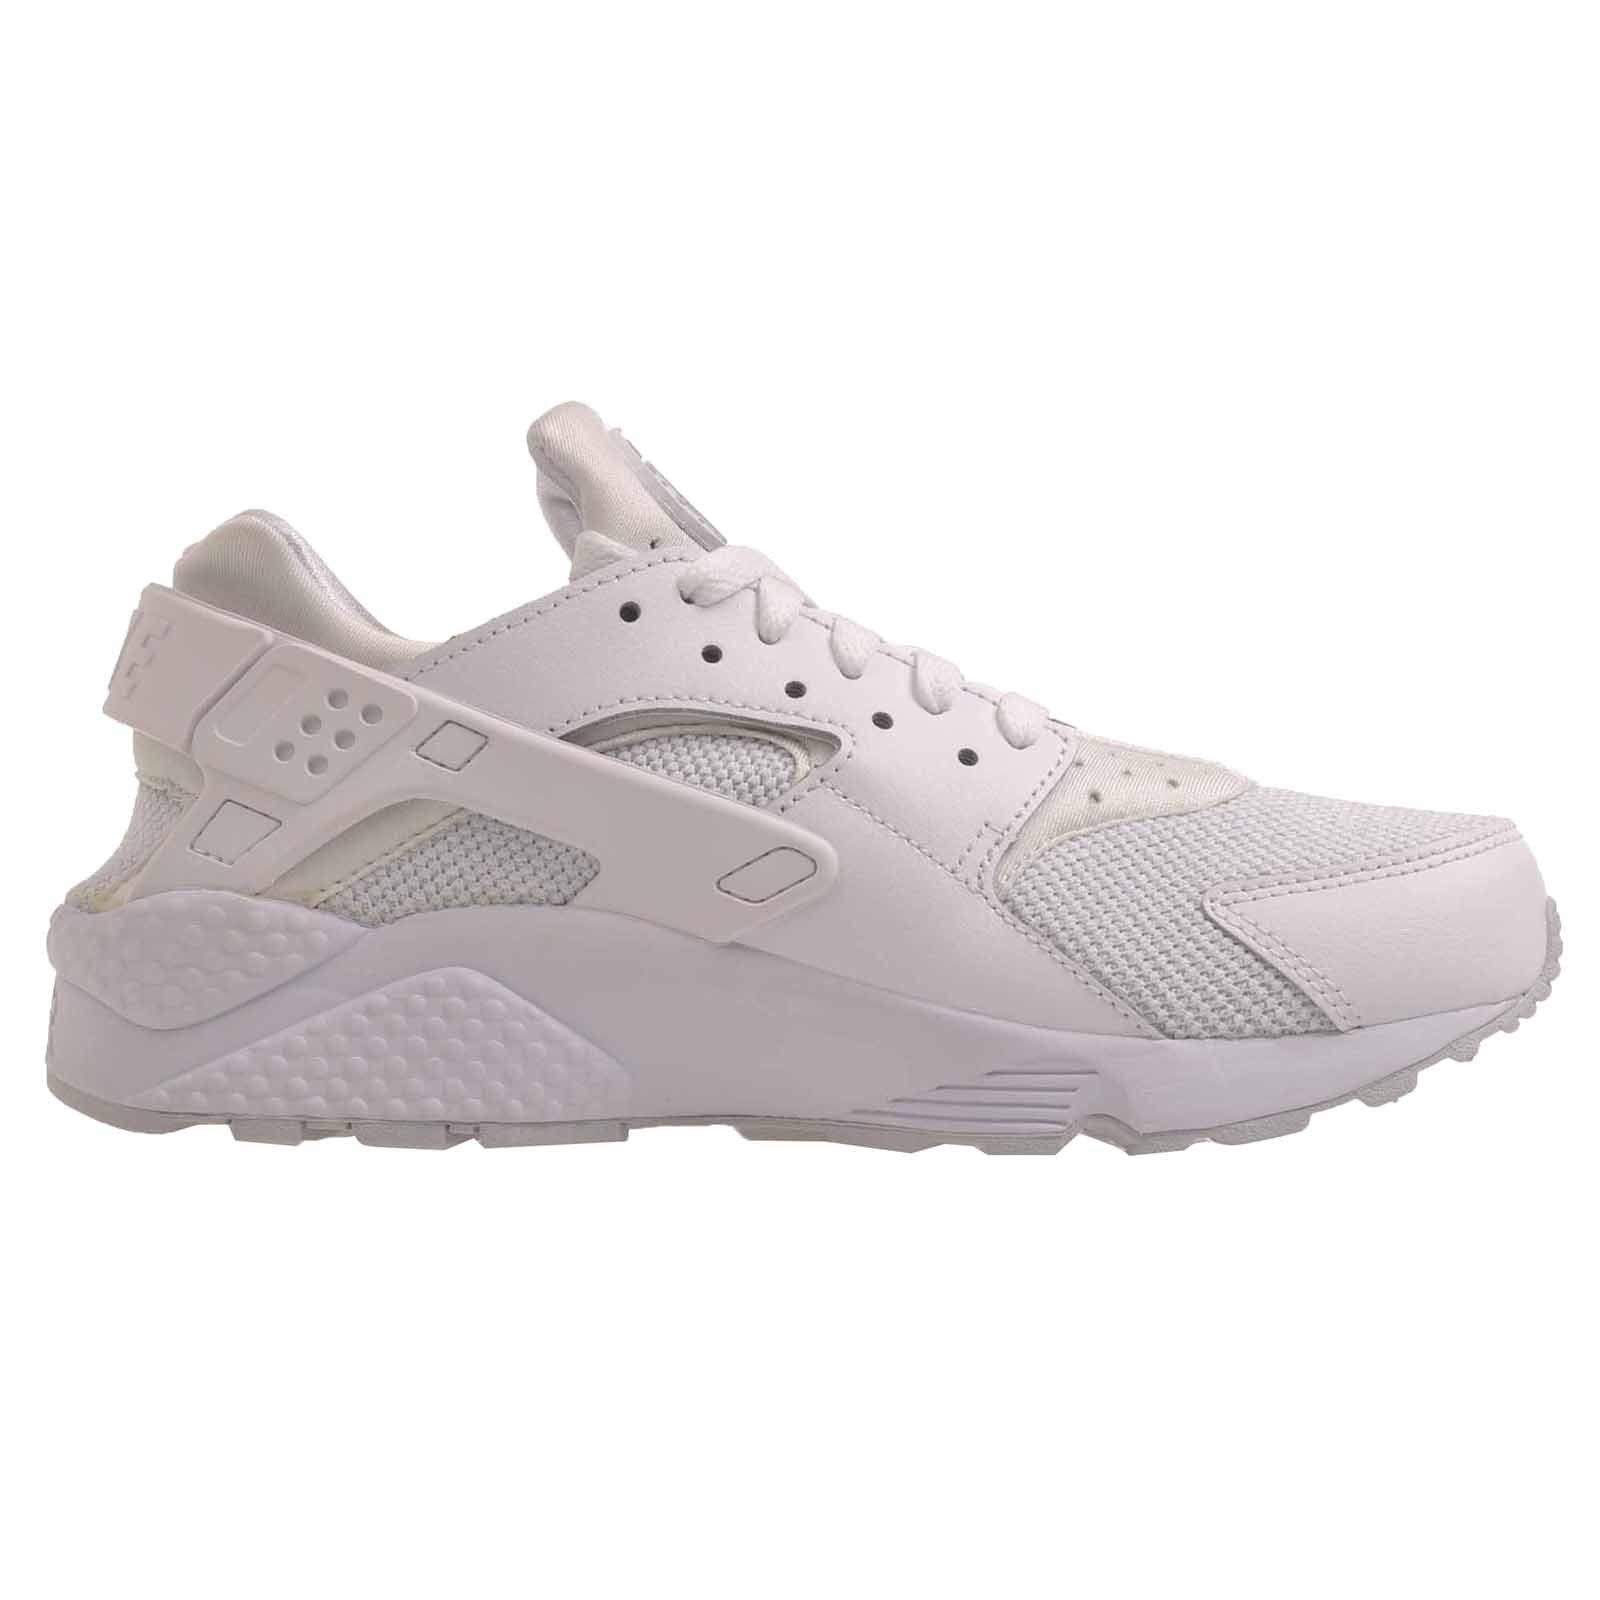 nike air huarache mens running trainers 318429 sneakers shoes (US 13, White Pure Platinum White 109)